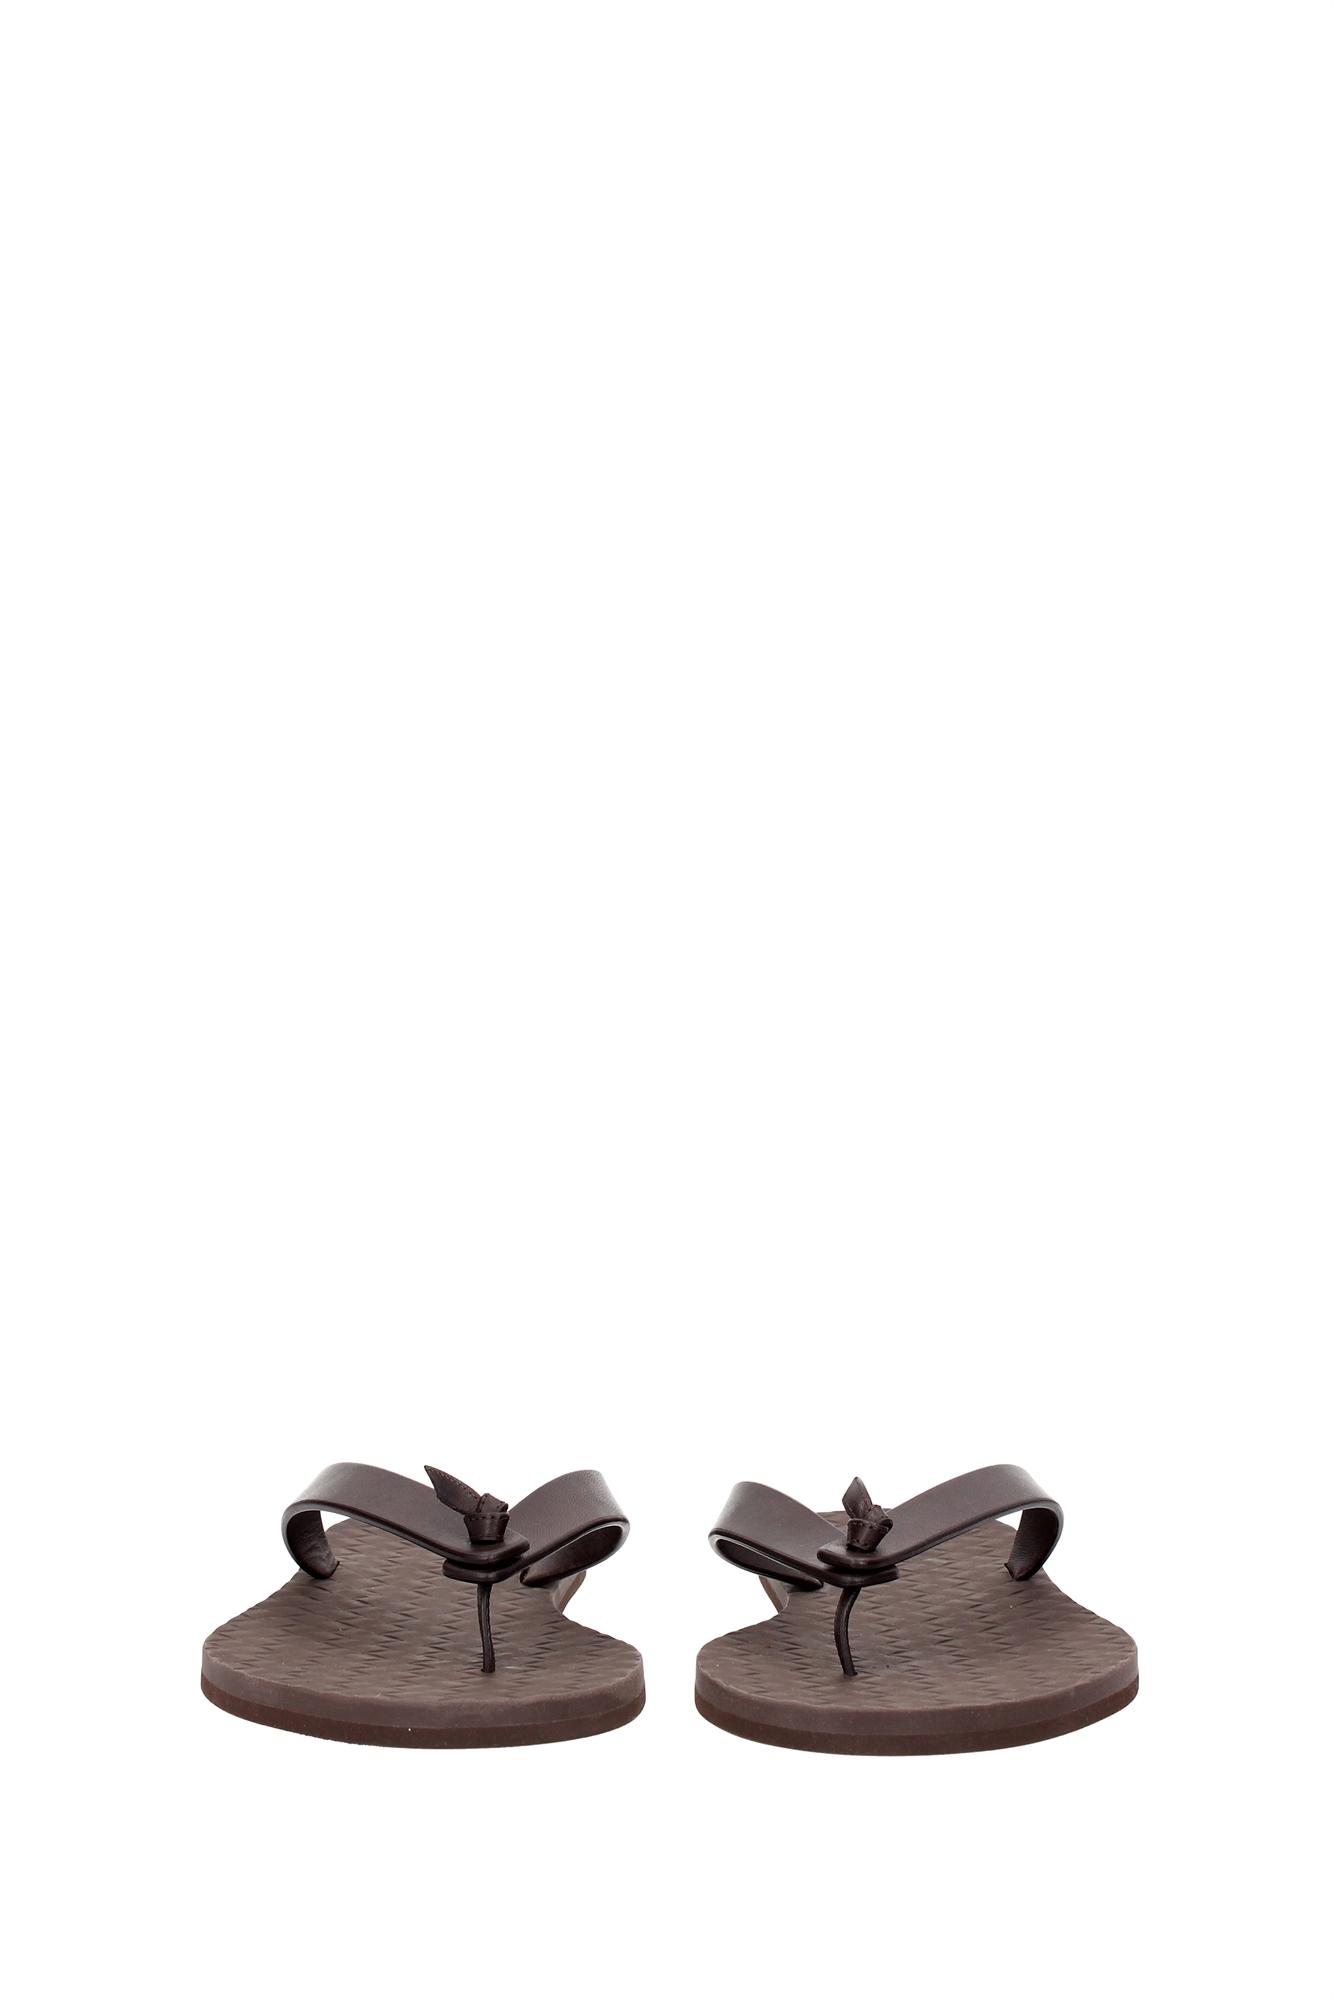 flip flops bottega veneta herren leder braun 298724vifh02037 ebay. Black Bedroom Furniture Sets. Home Design Ideas